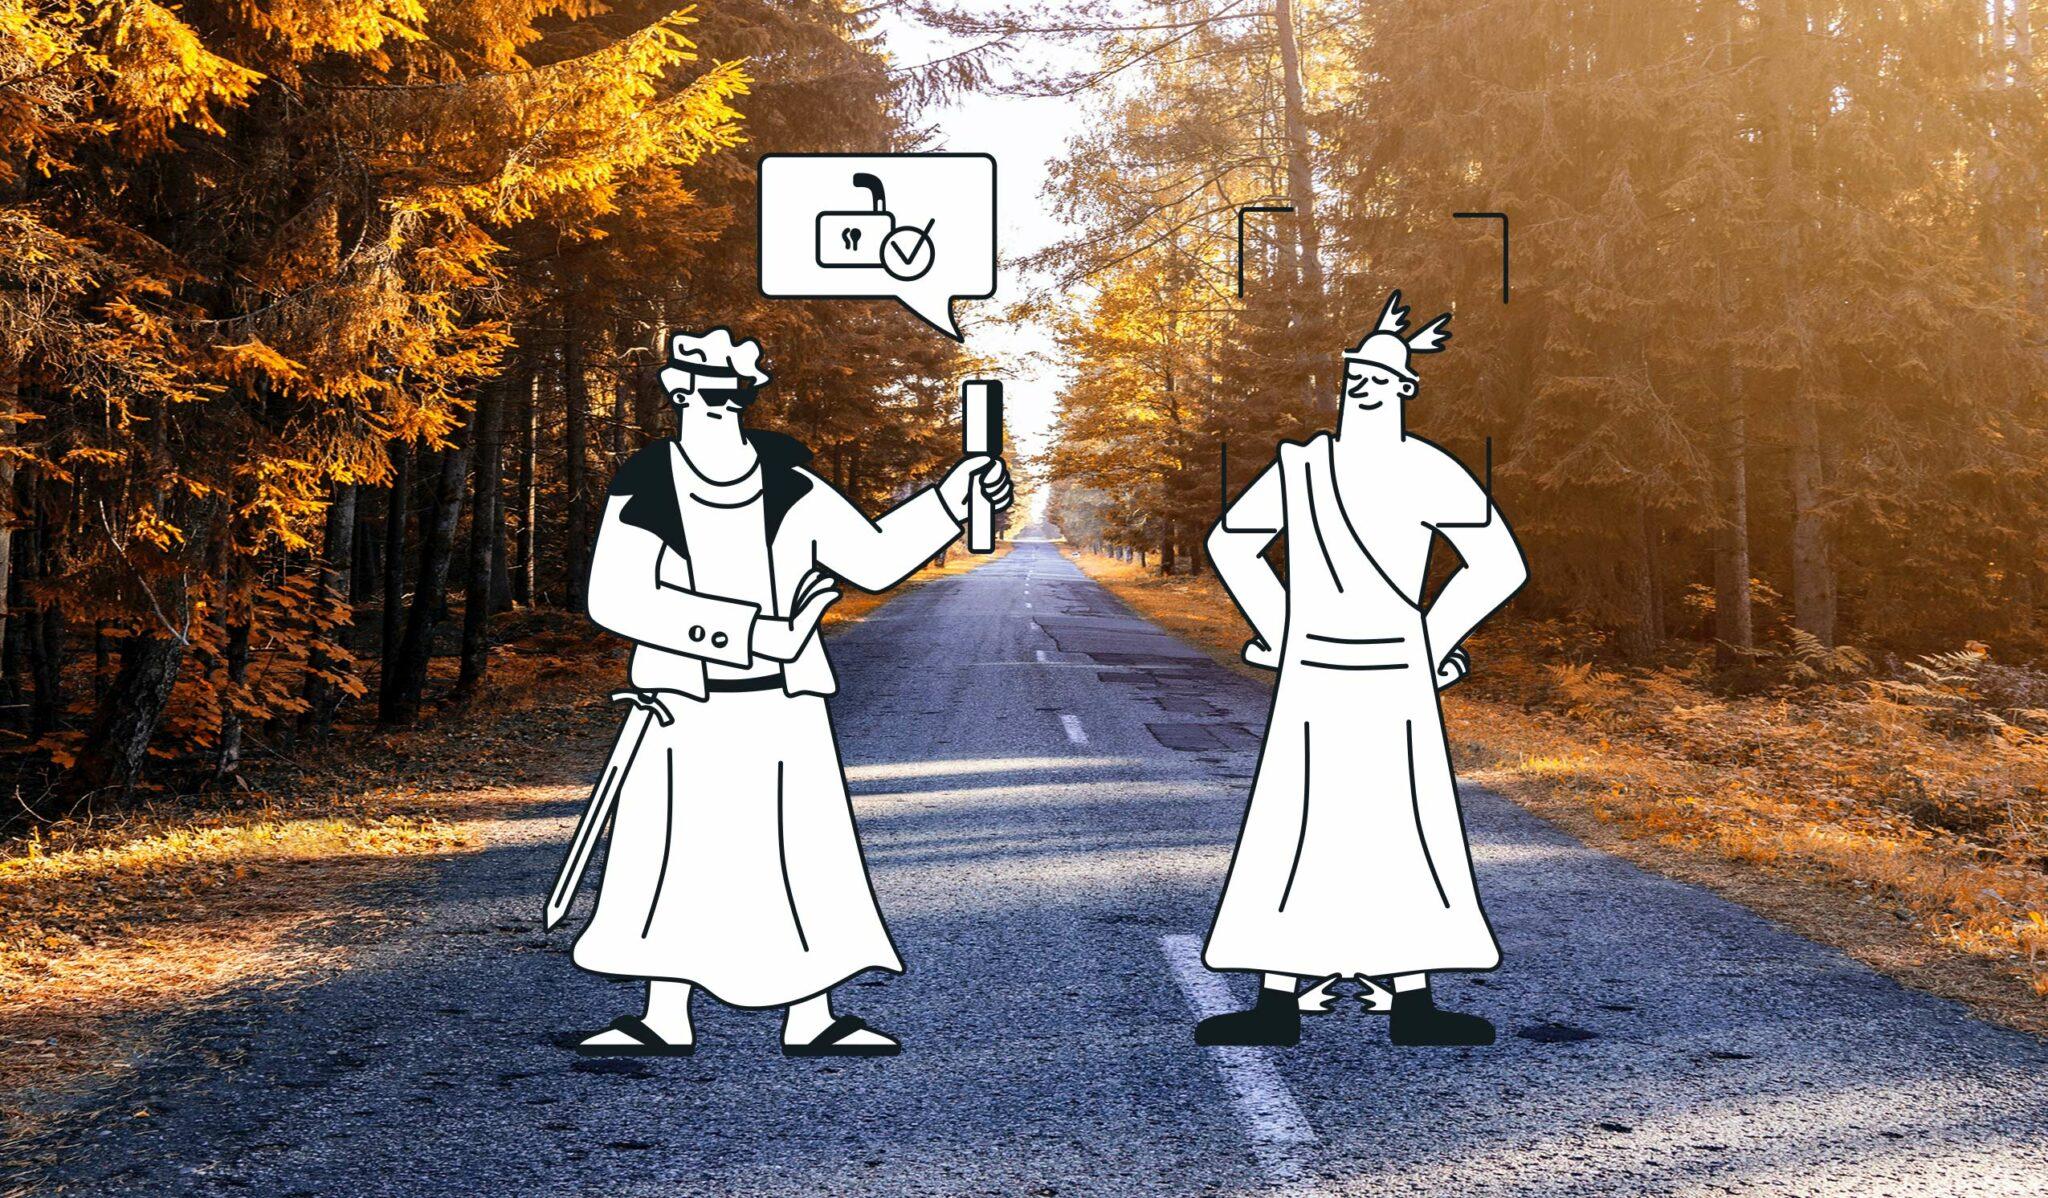 Greek god cartoon characters on wooded path